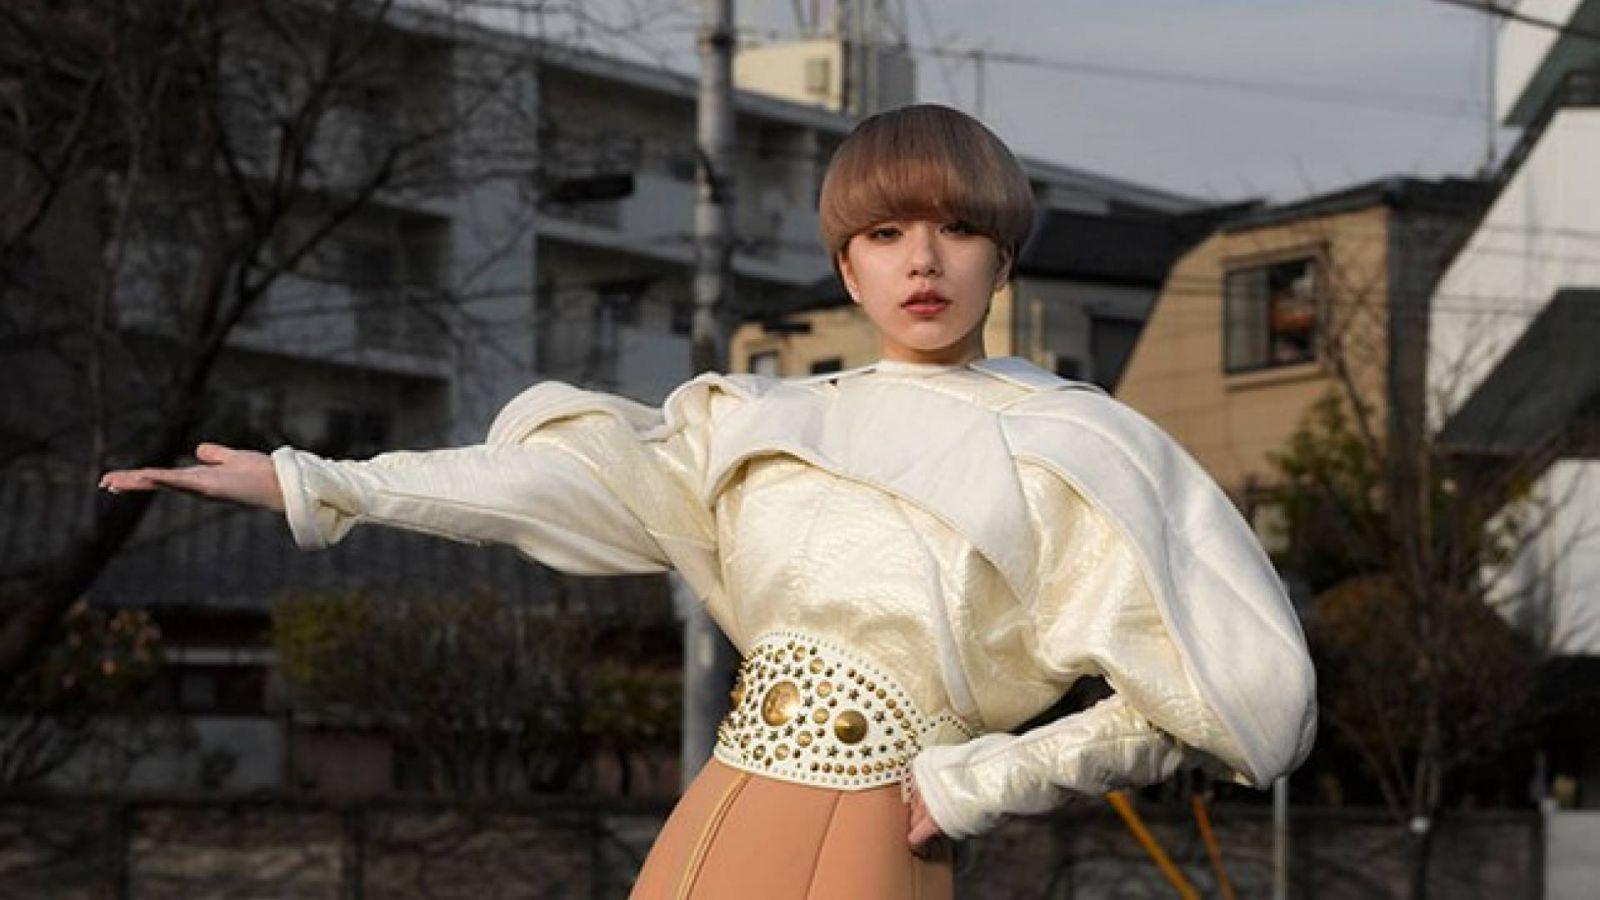 Wywiad z Uną na Japan Expo © Una - Asobi System - All Rights Reserved